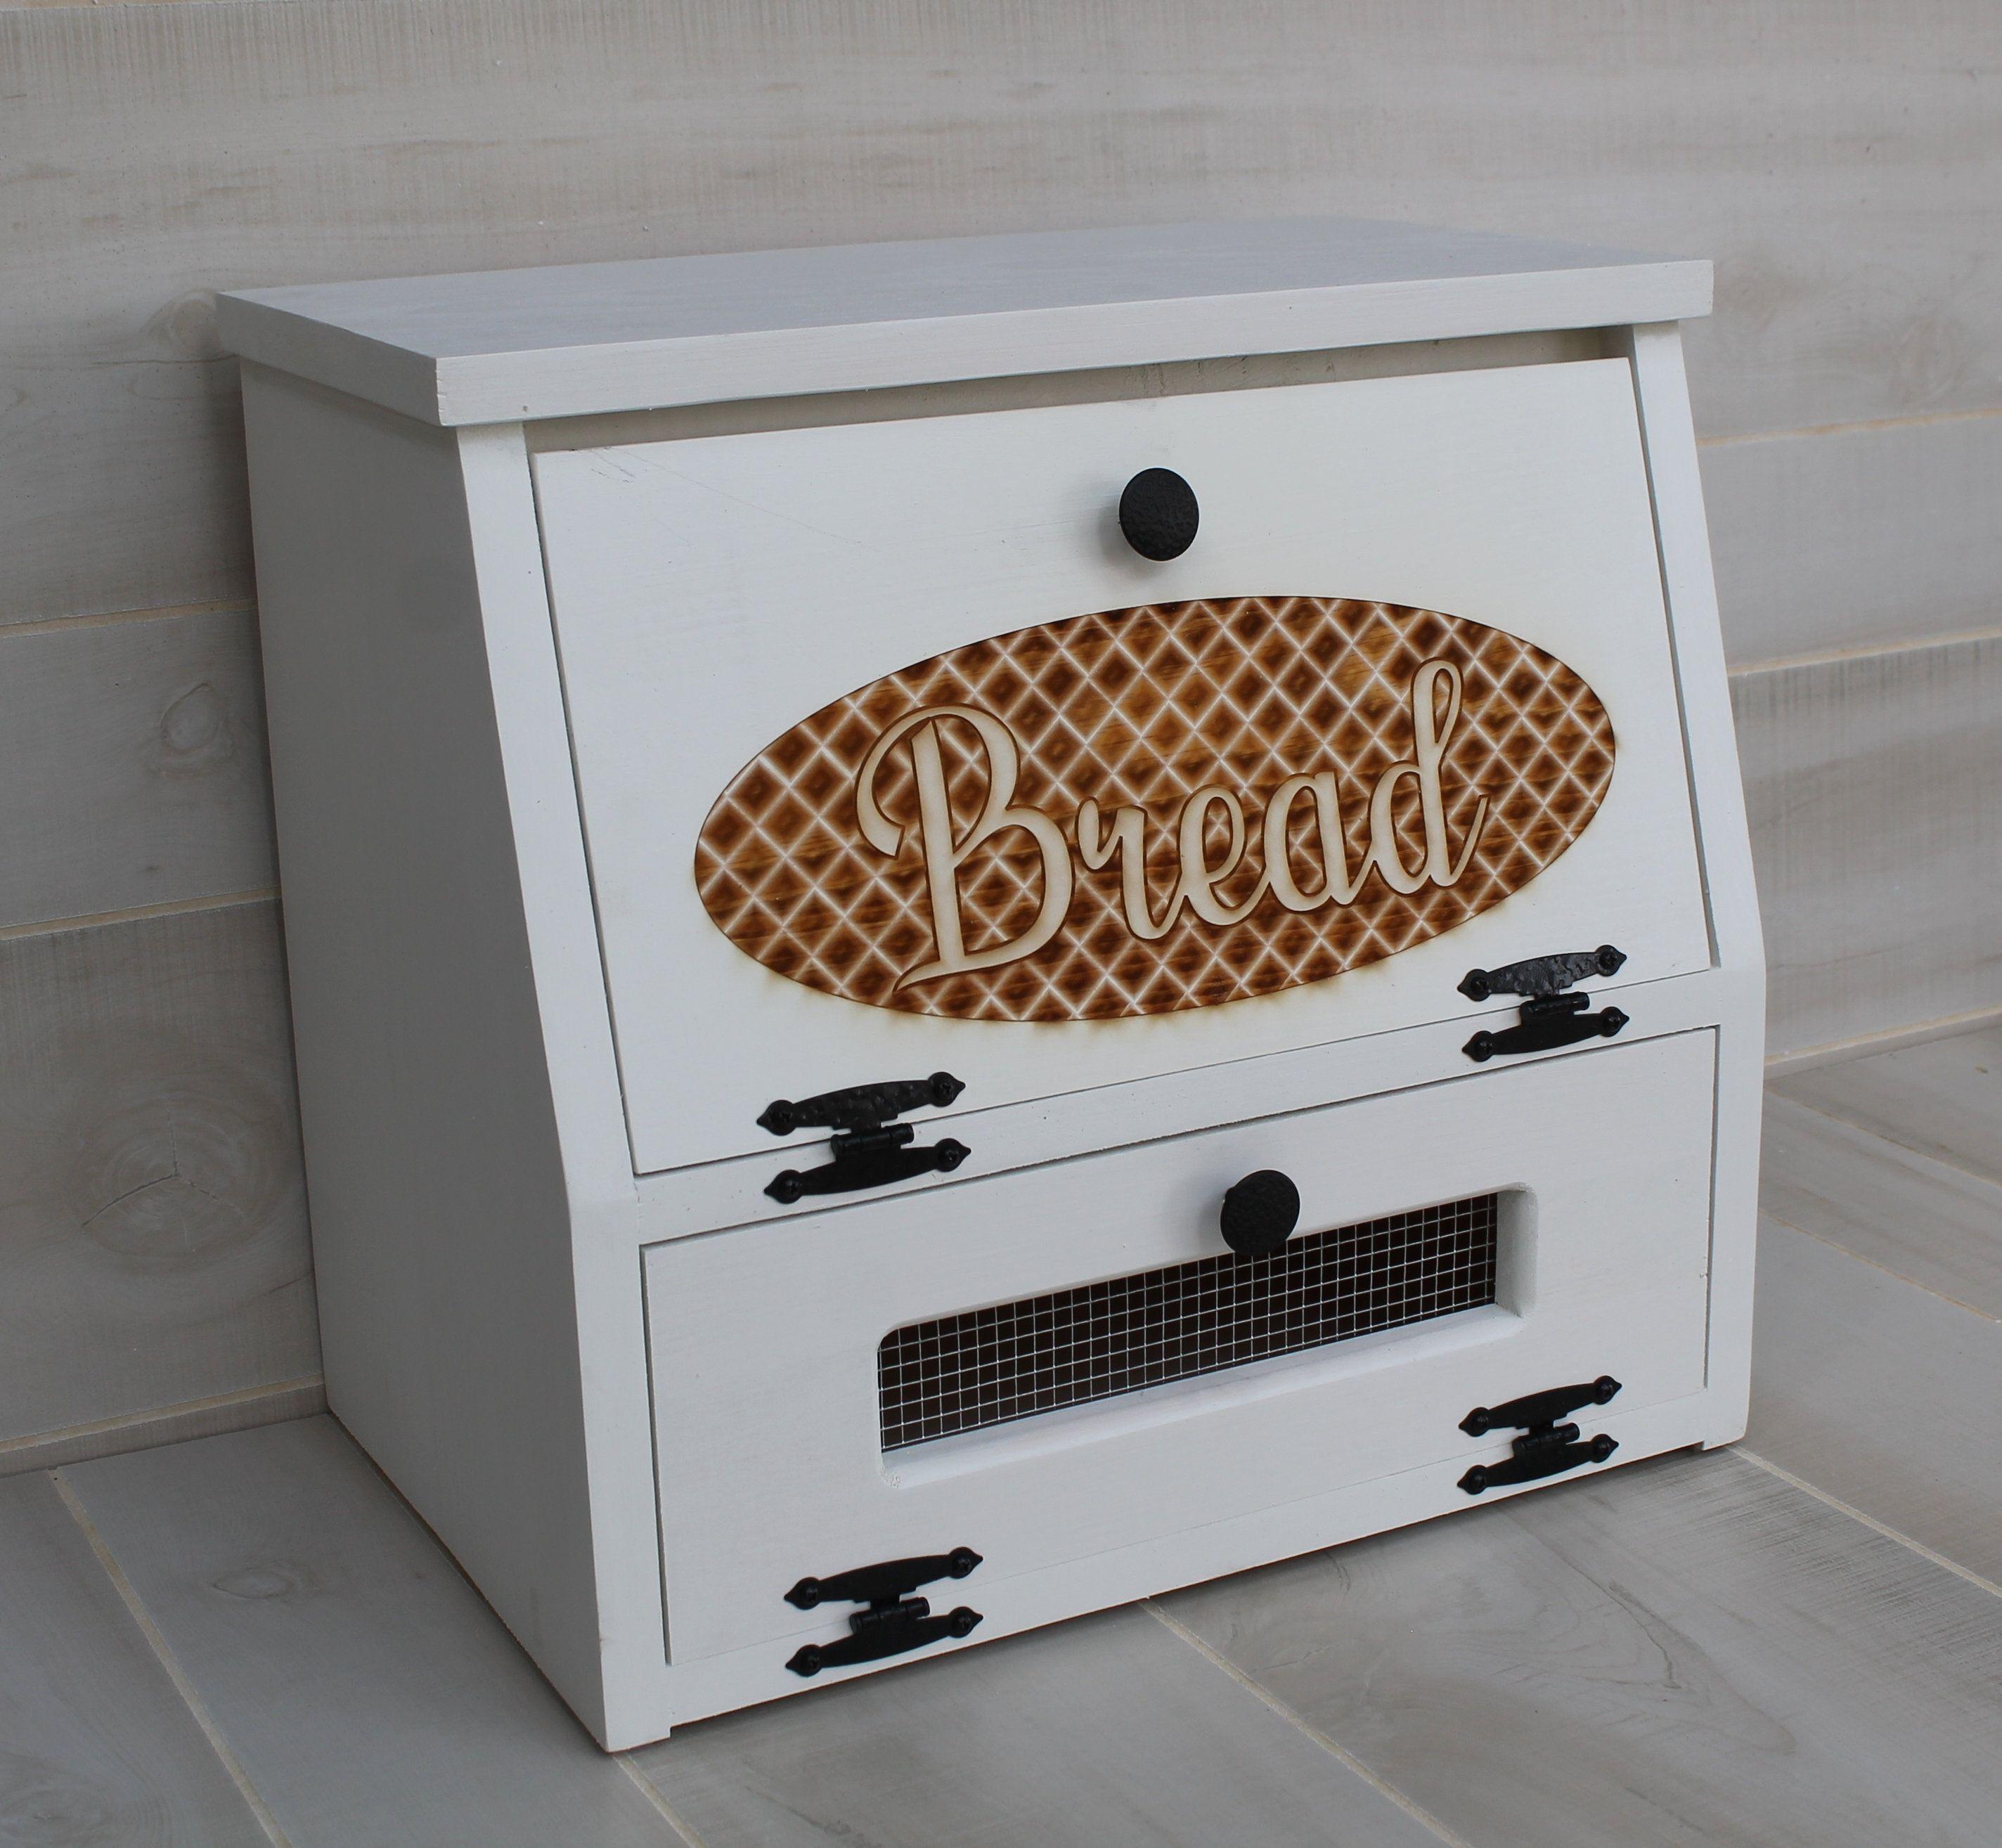 Bread Box Potato Vegetable Bin Farmhouse Chic Wooden Engraved